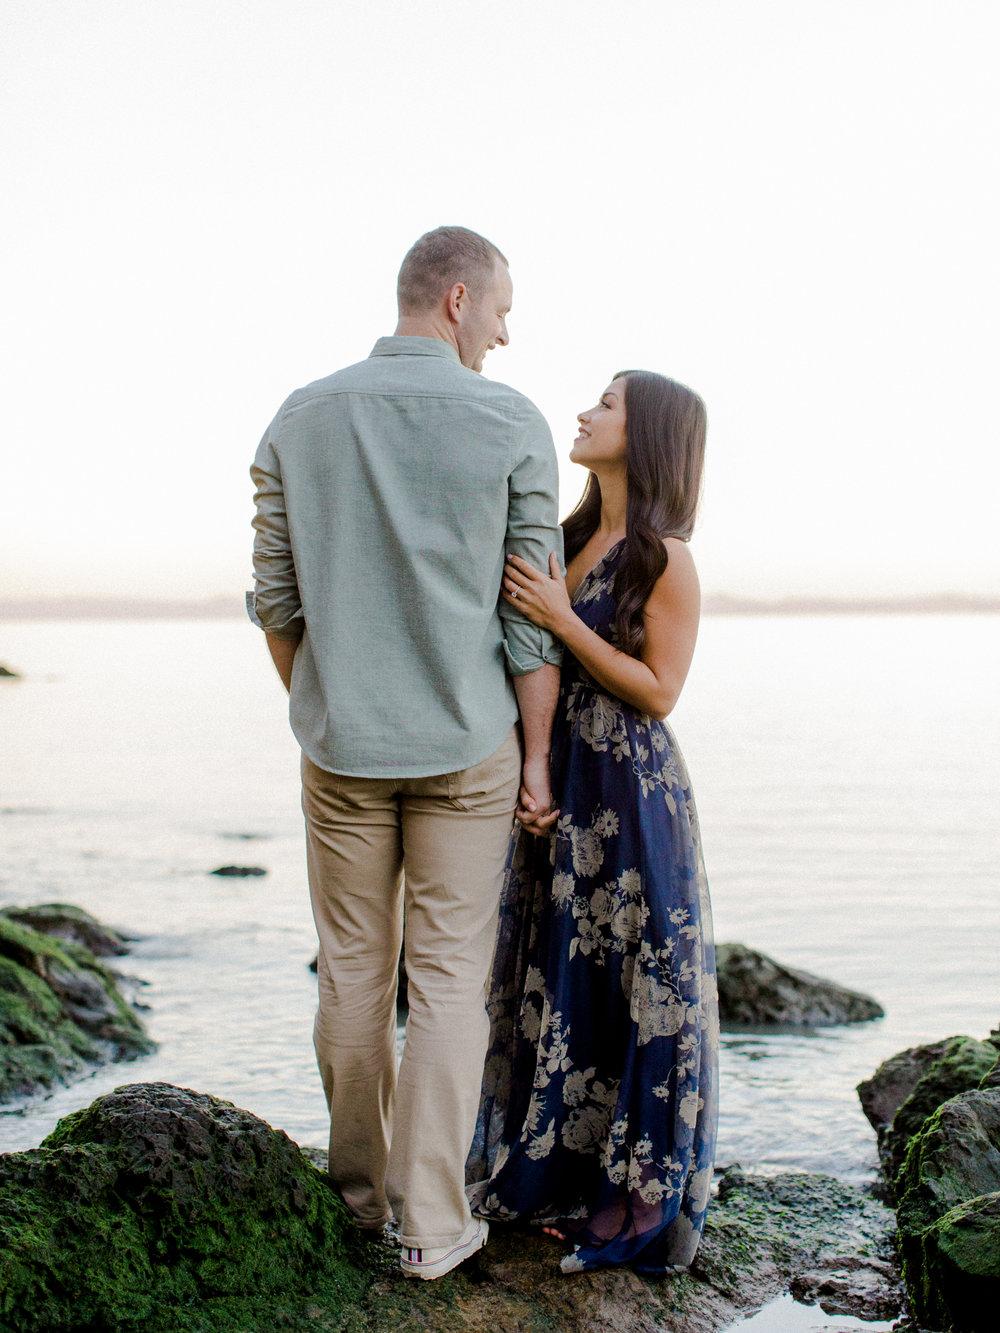 Deanna-John-Bay-Area-Engagement-Session-Brandon-J-Ferlin-Photography-58.jpg